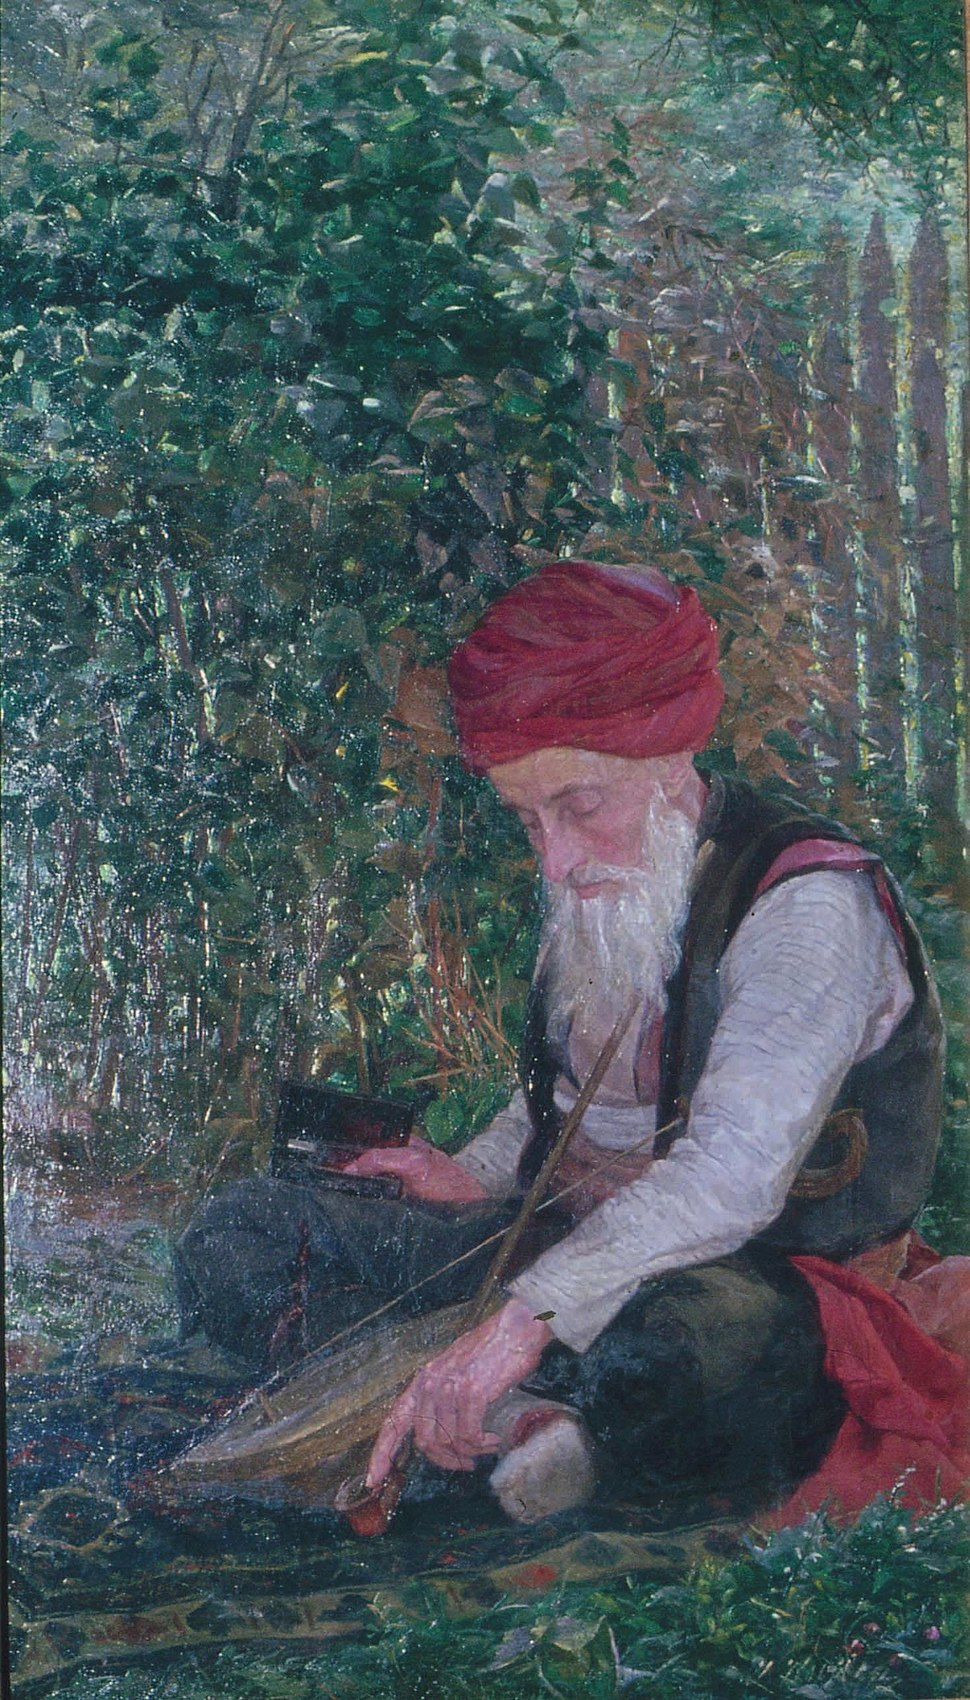 Ivana Kobilca - Bošnjak z goslimi